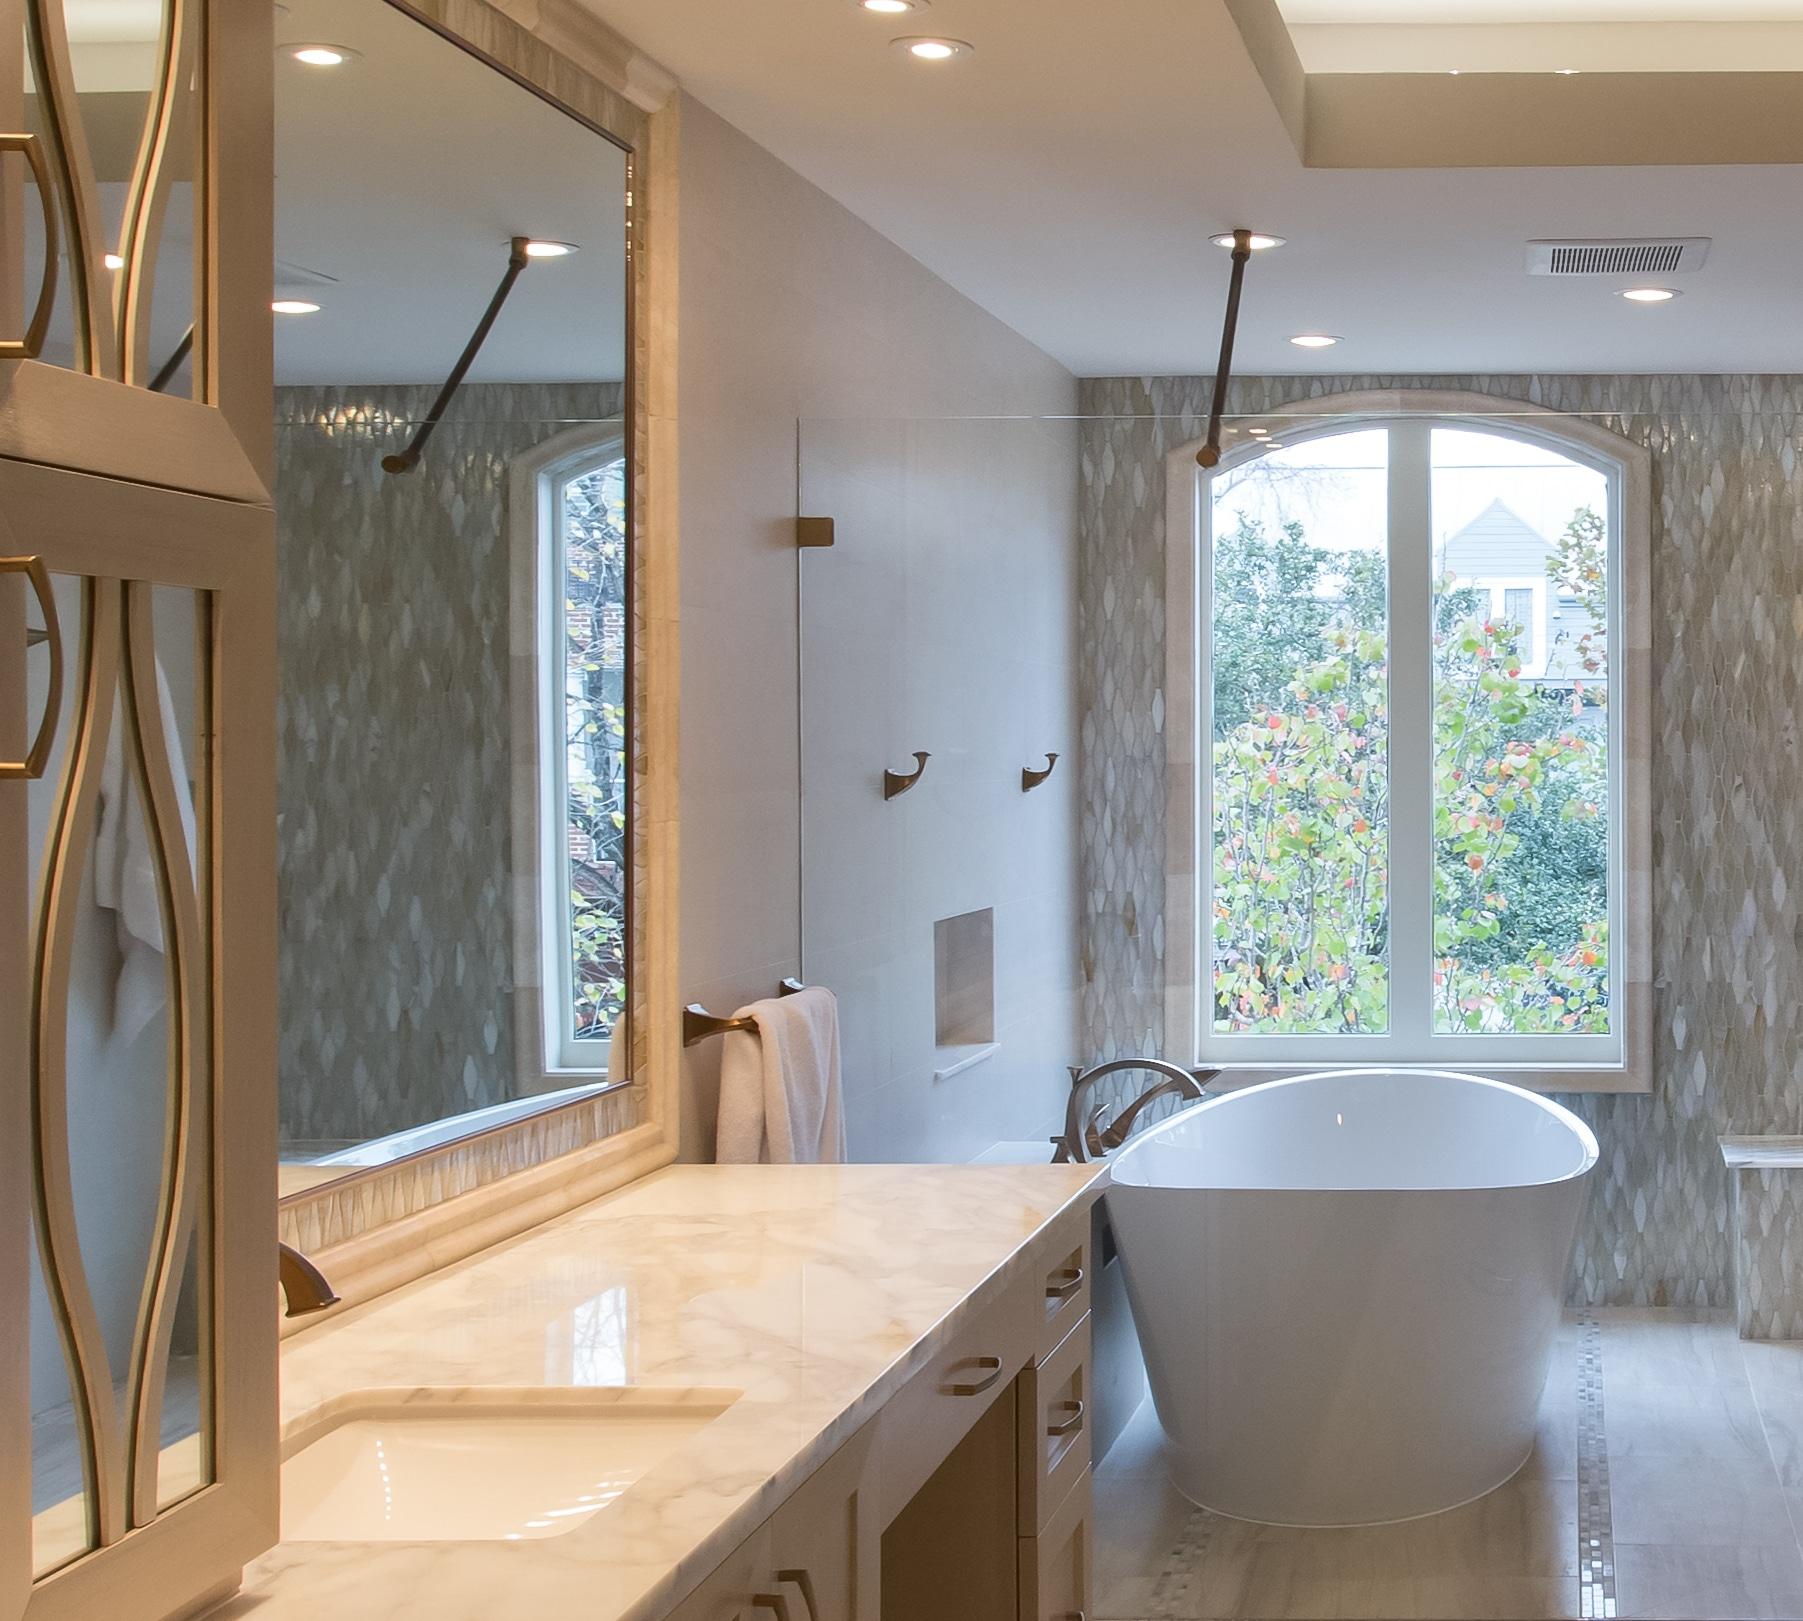 River Oaks   Houston, Texas   Tranquil Spa Master Bathroom Remodel (6 of 10)